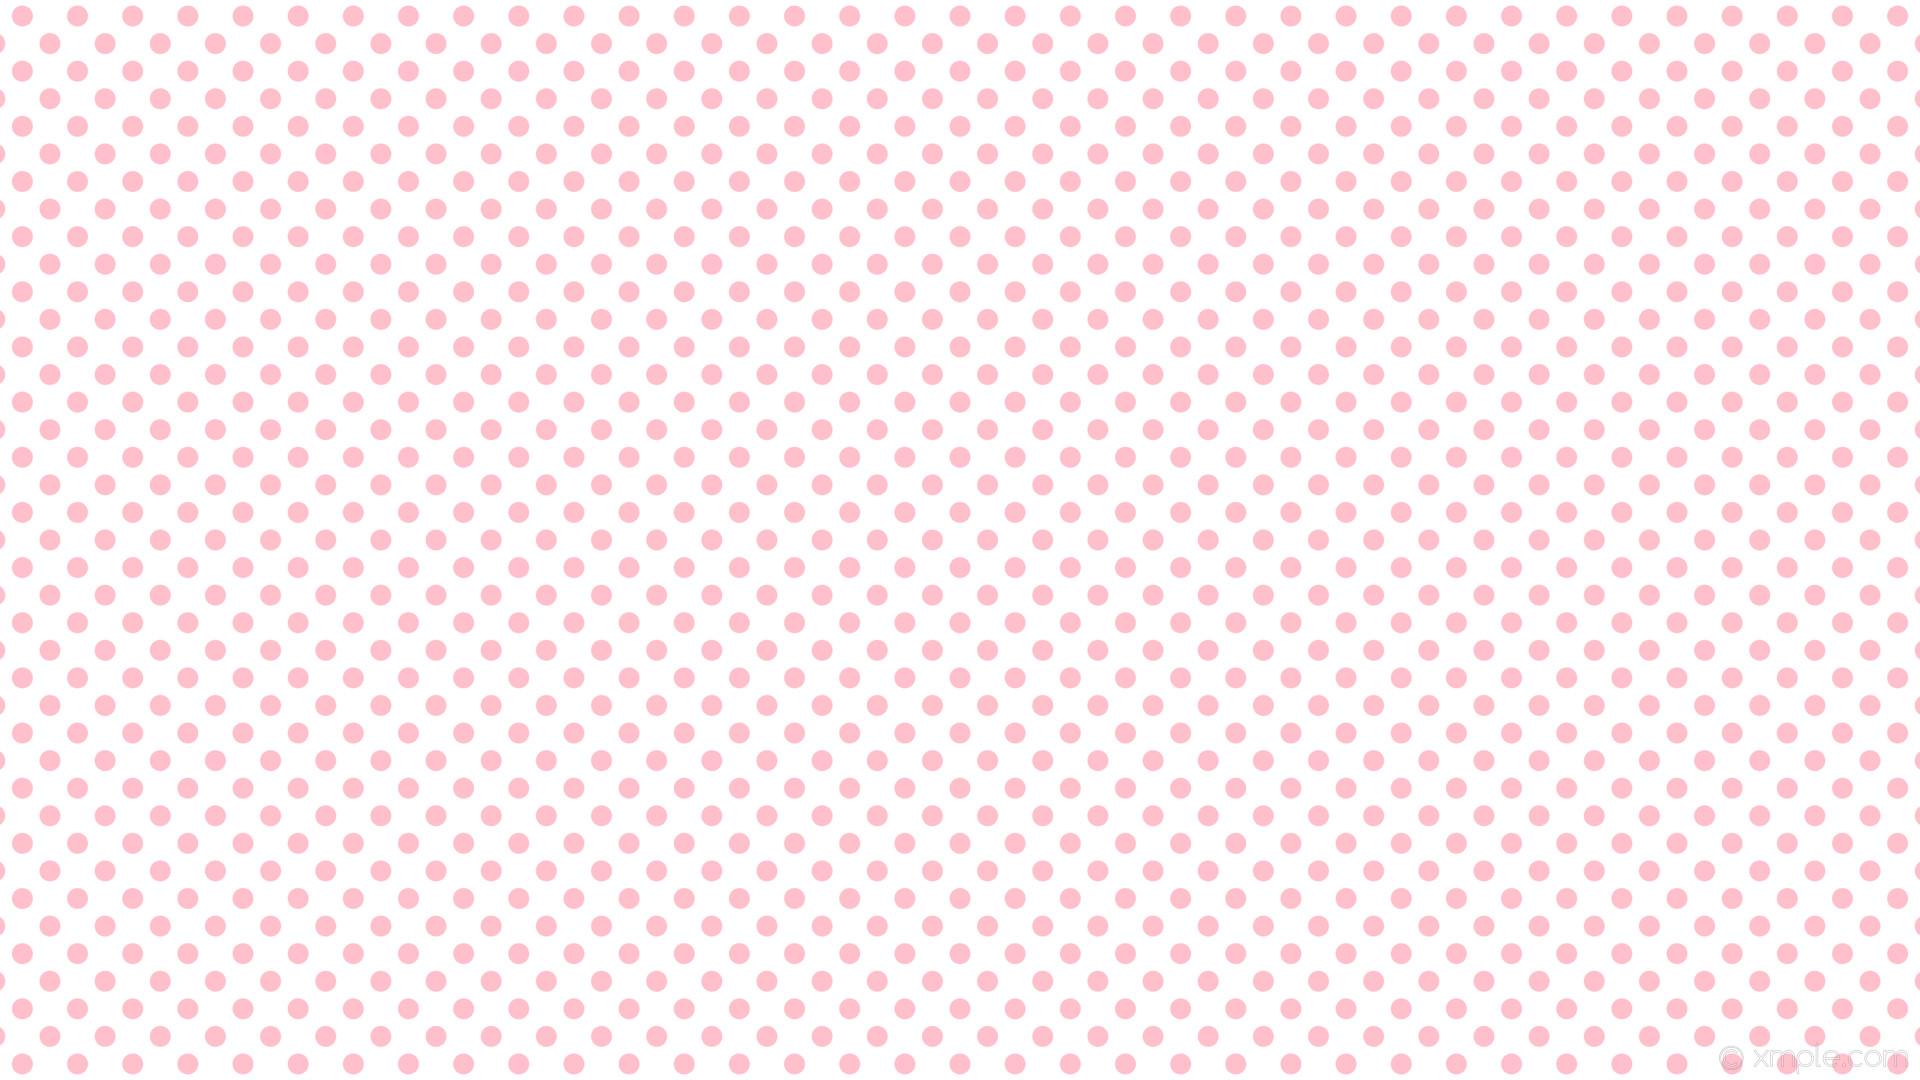 wallpaper white polka dots spots pink #ffffff #ffc0cb 315° 21px 39px